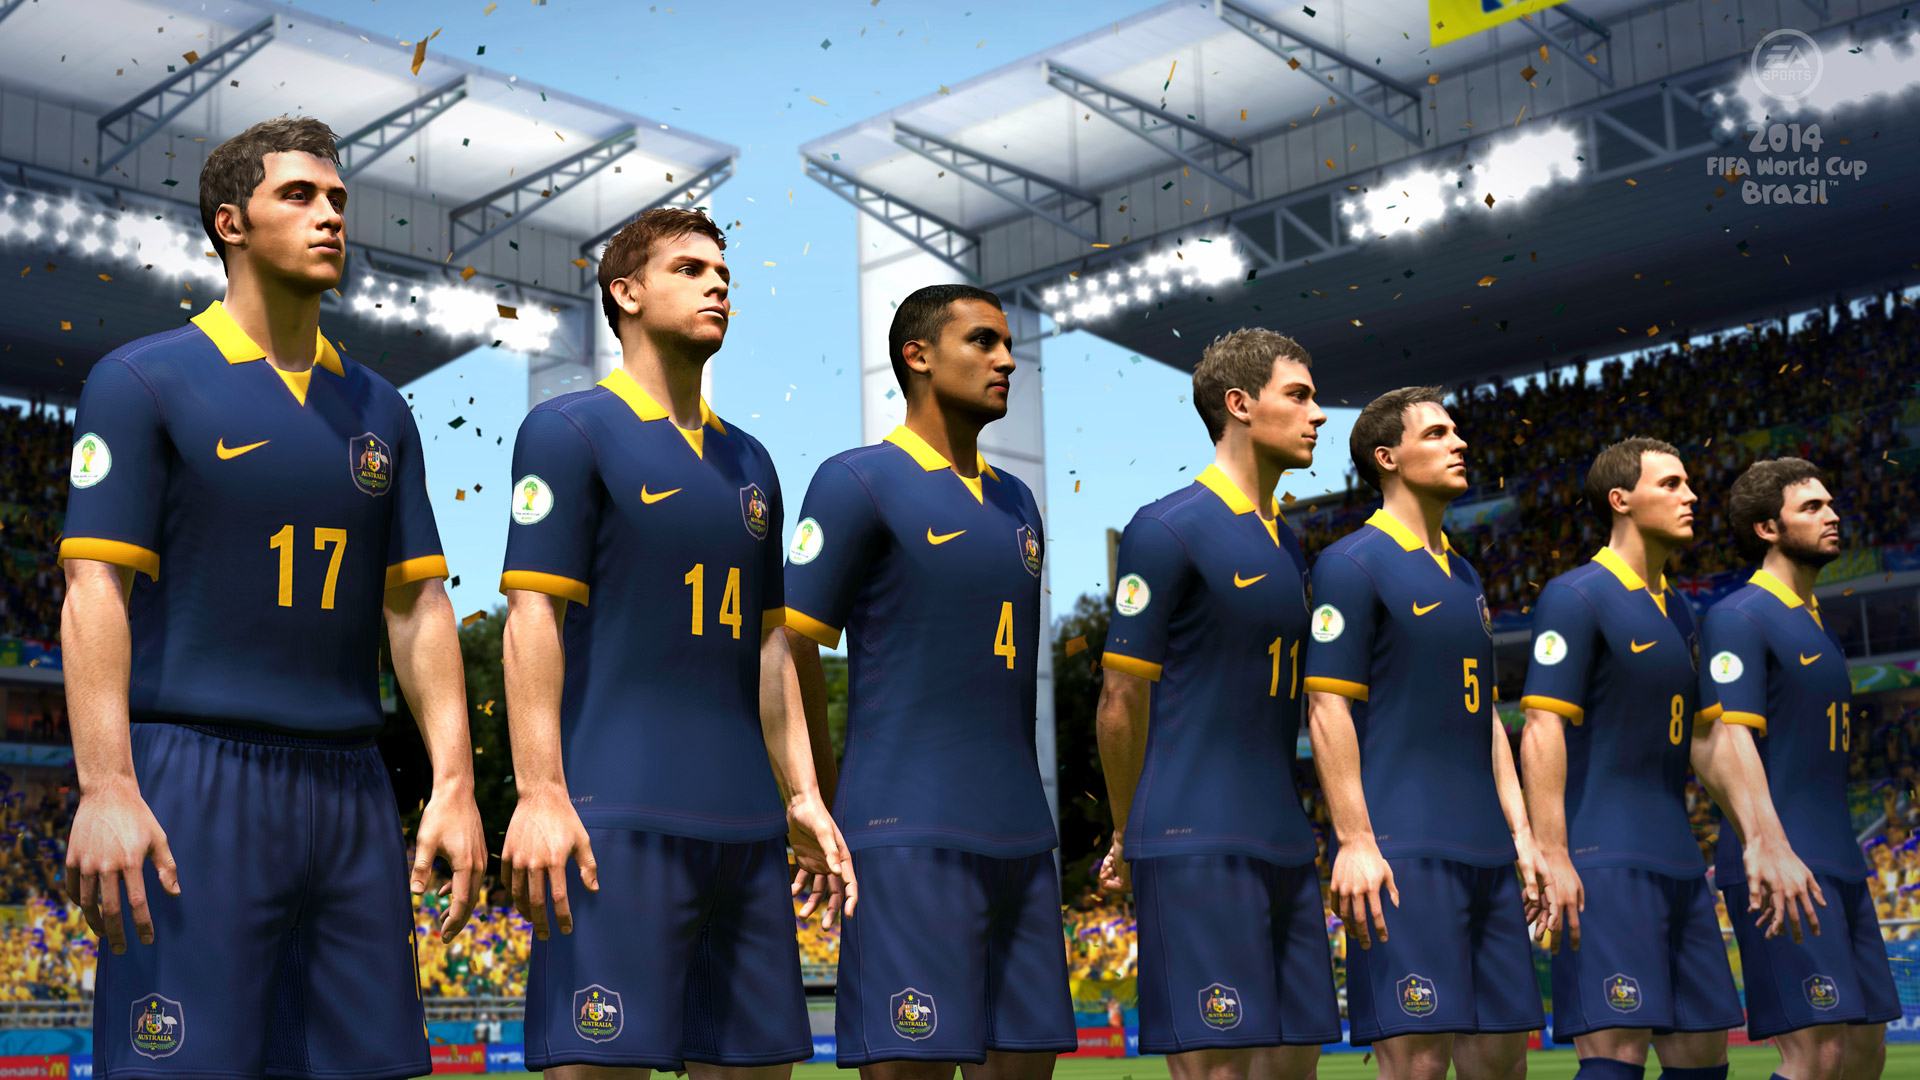 2014 FIFA World Cup Brazil Wallpaper in 1920x1080